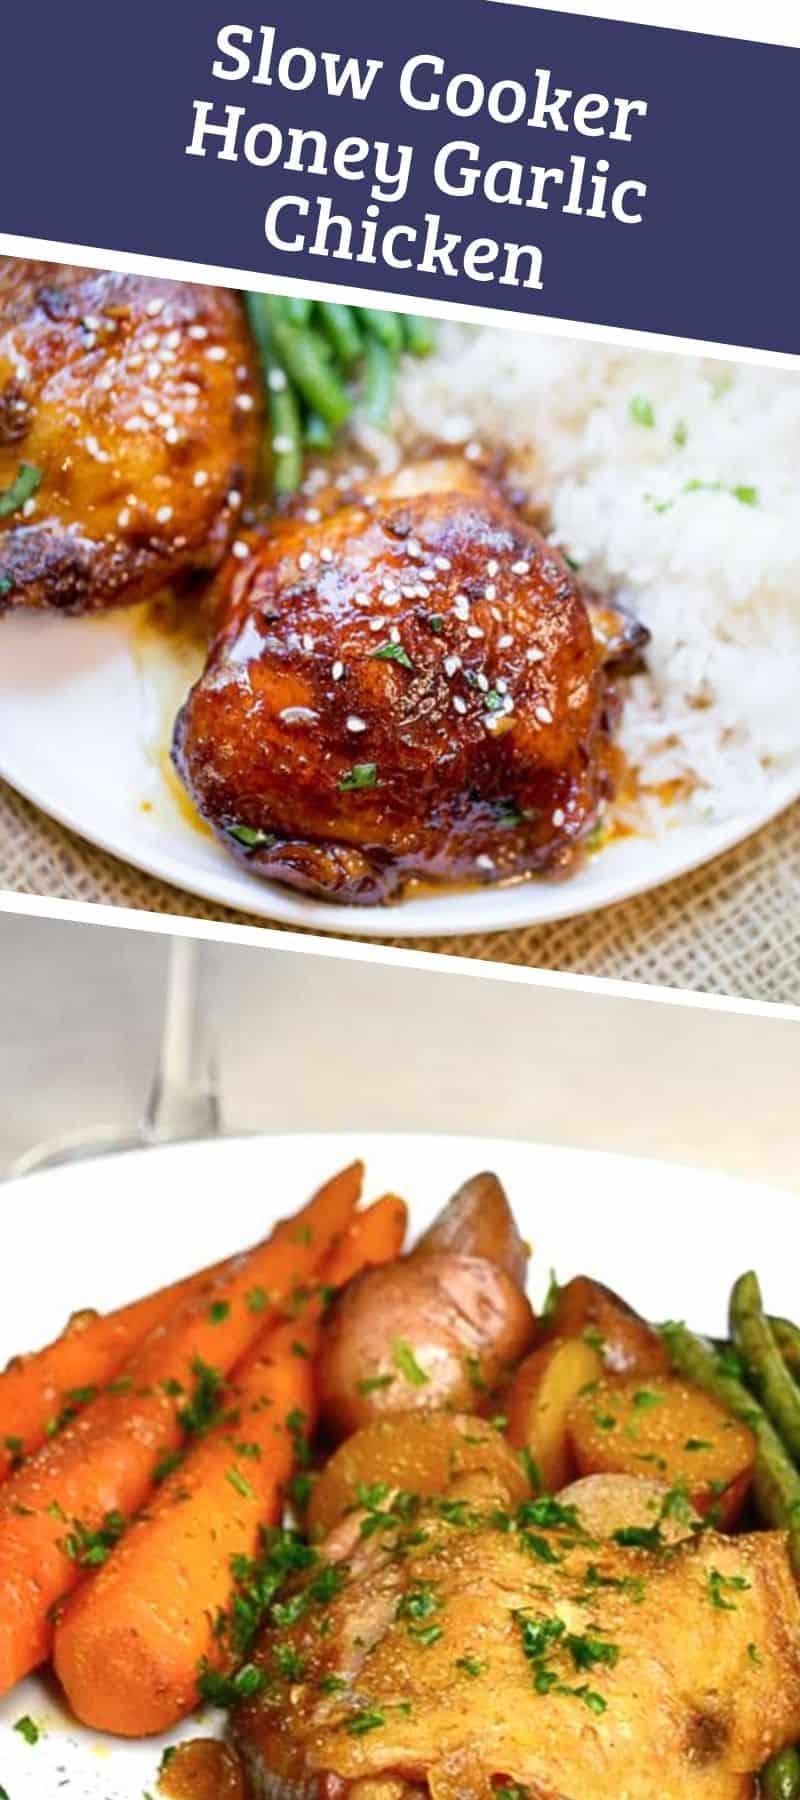 Slow Cooker Honey Garlic Chicken 3